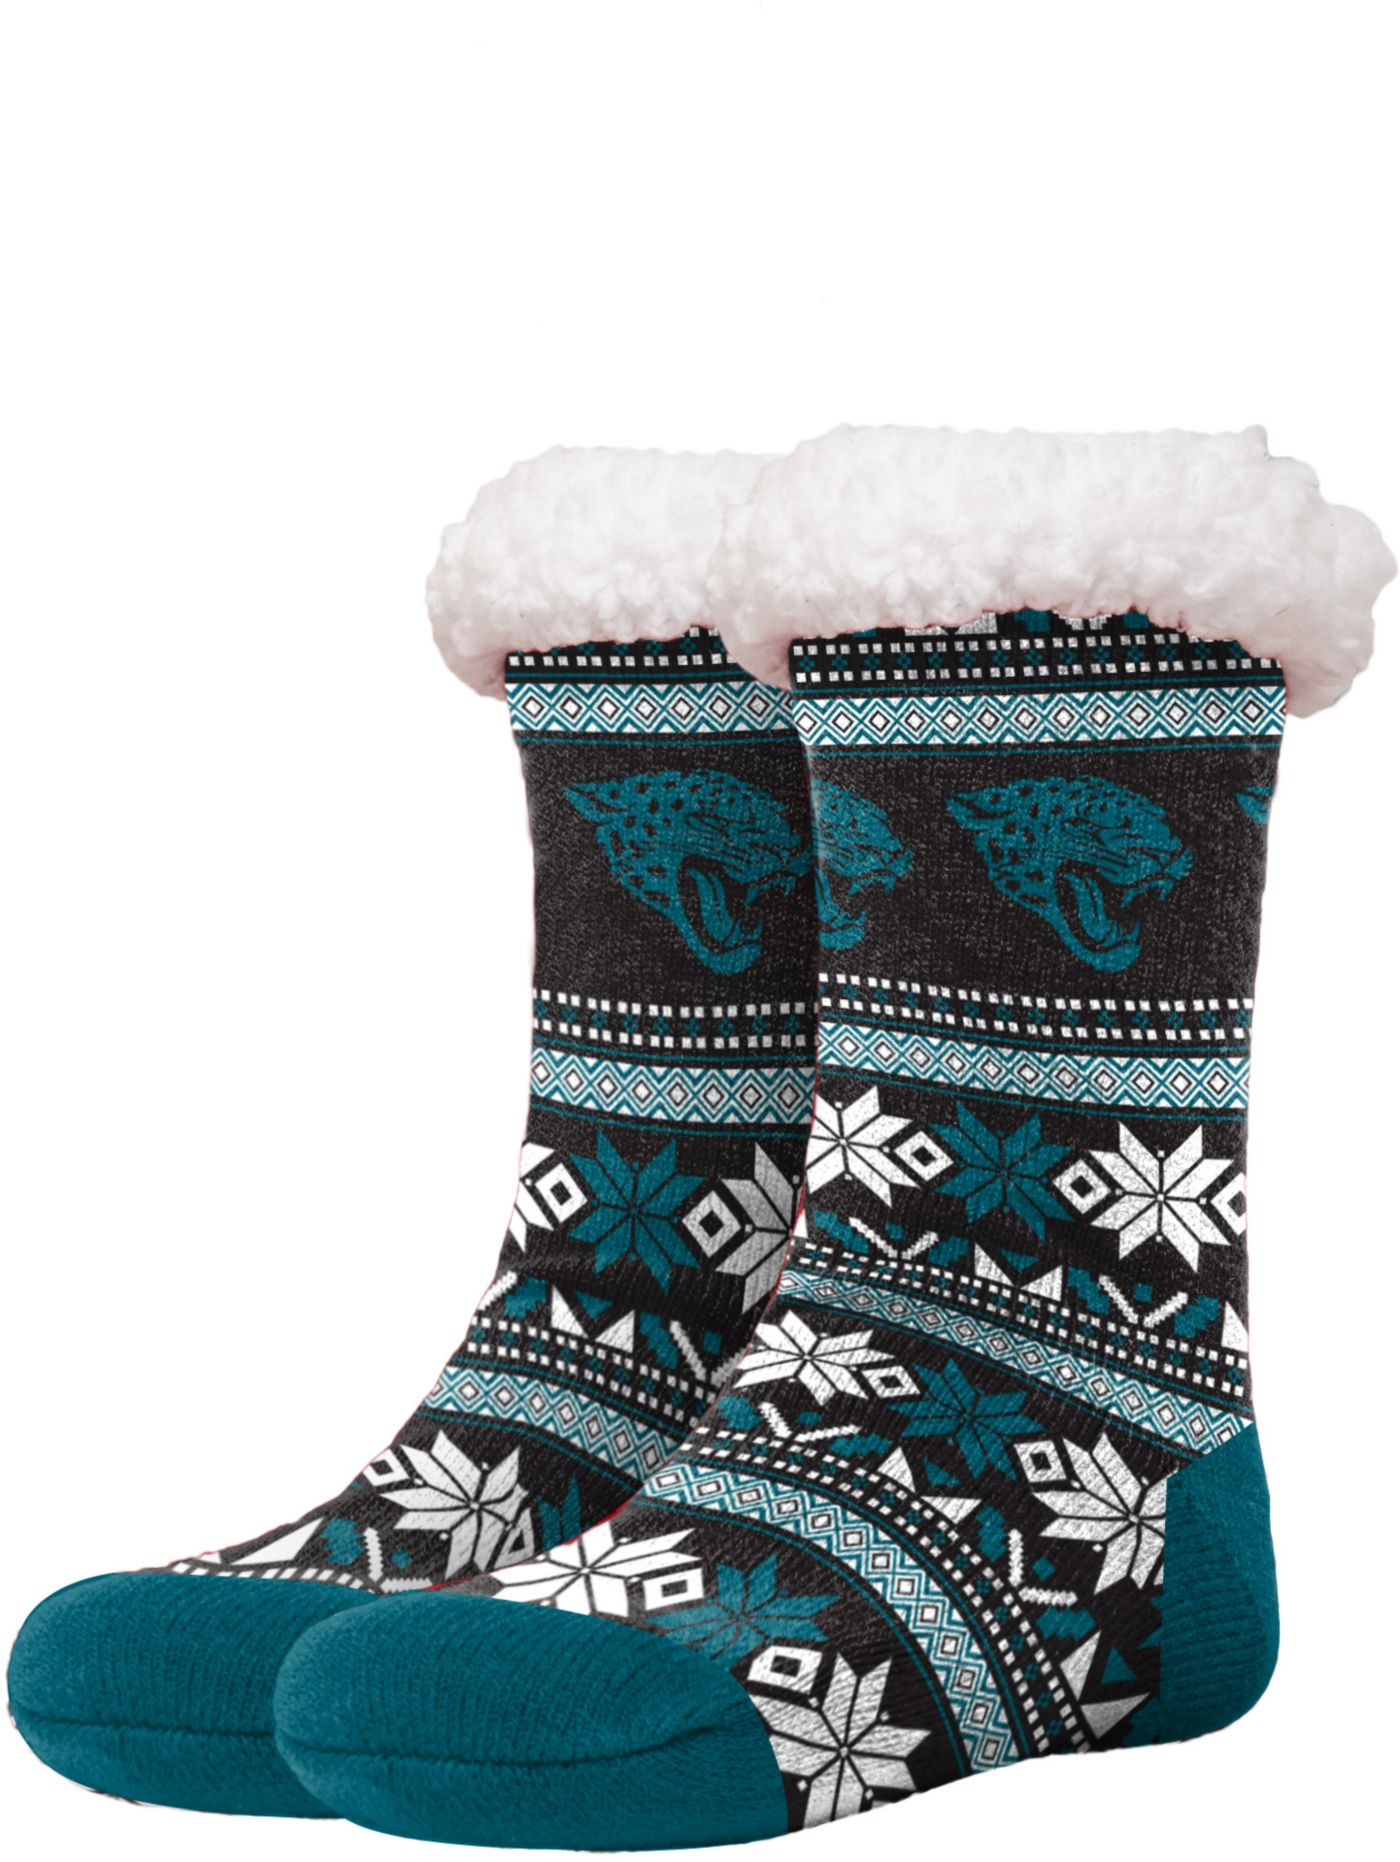 FOCO Jacksonville Jaguars Footy Slippers